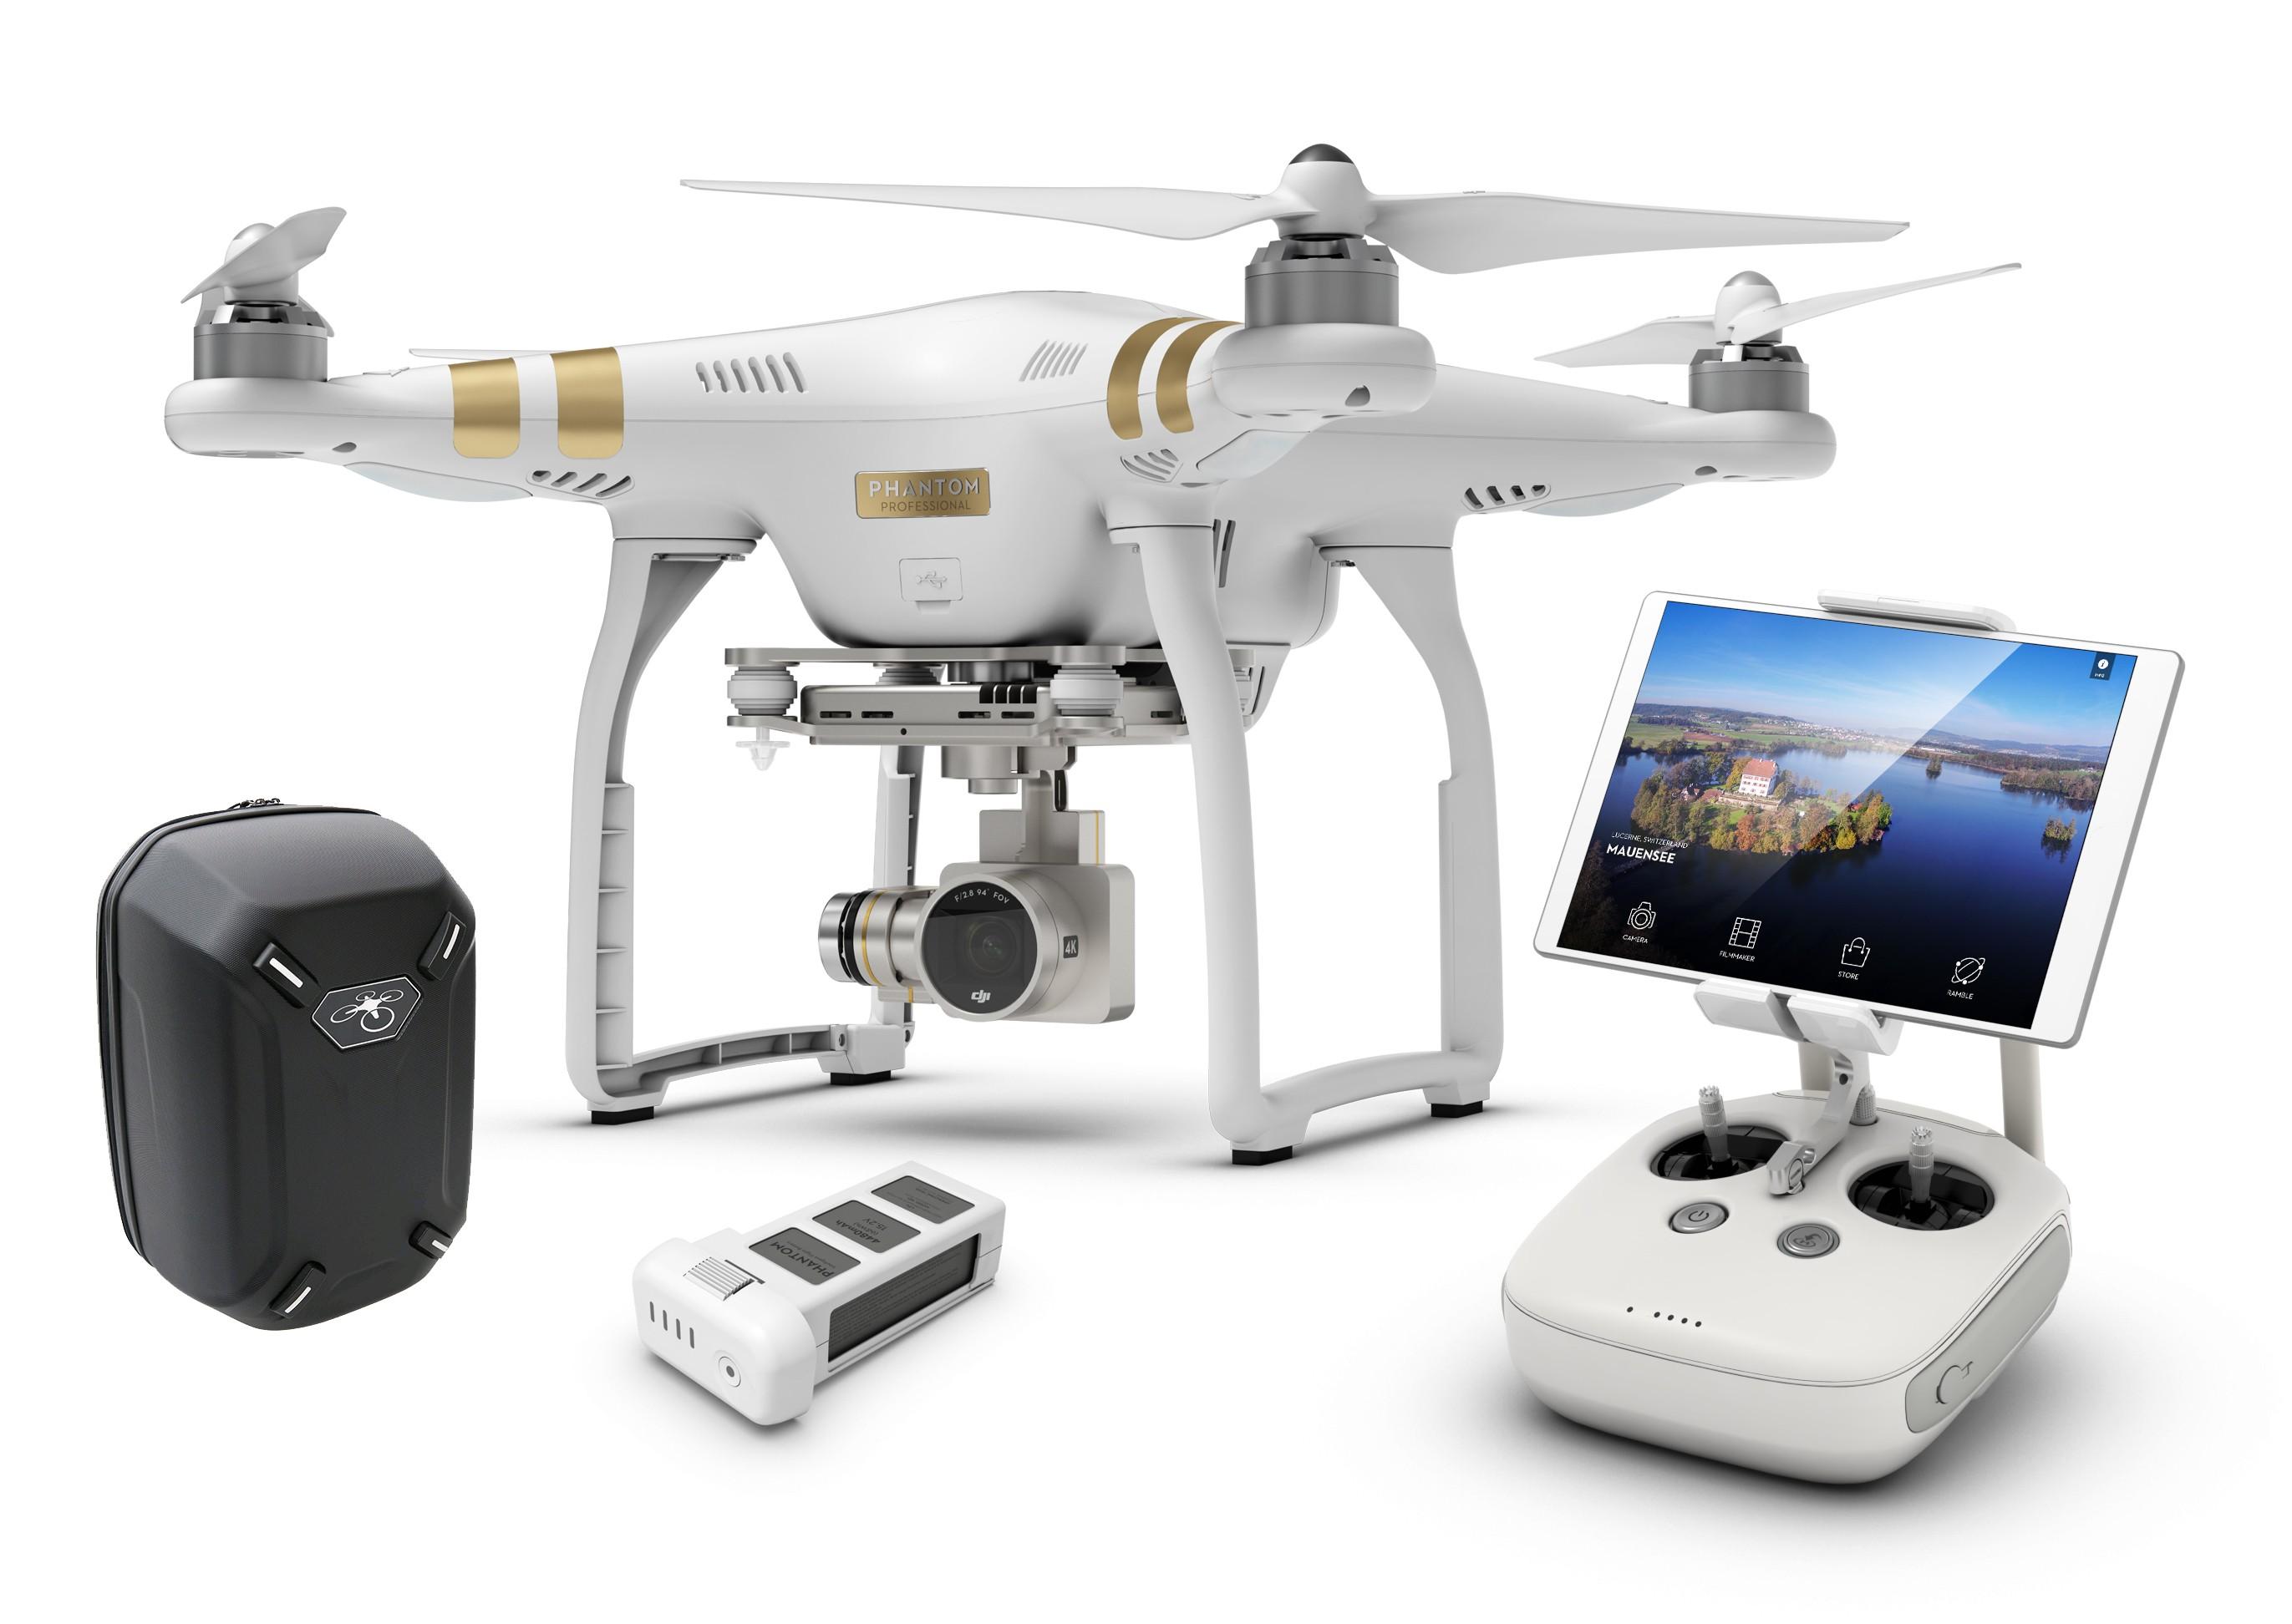 phantom 3 professional pack aventure bdl ph3pbatsadph droneshop. Black Bedroom Furniture Sets. Home Design Ideas